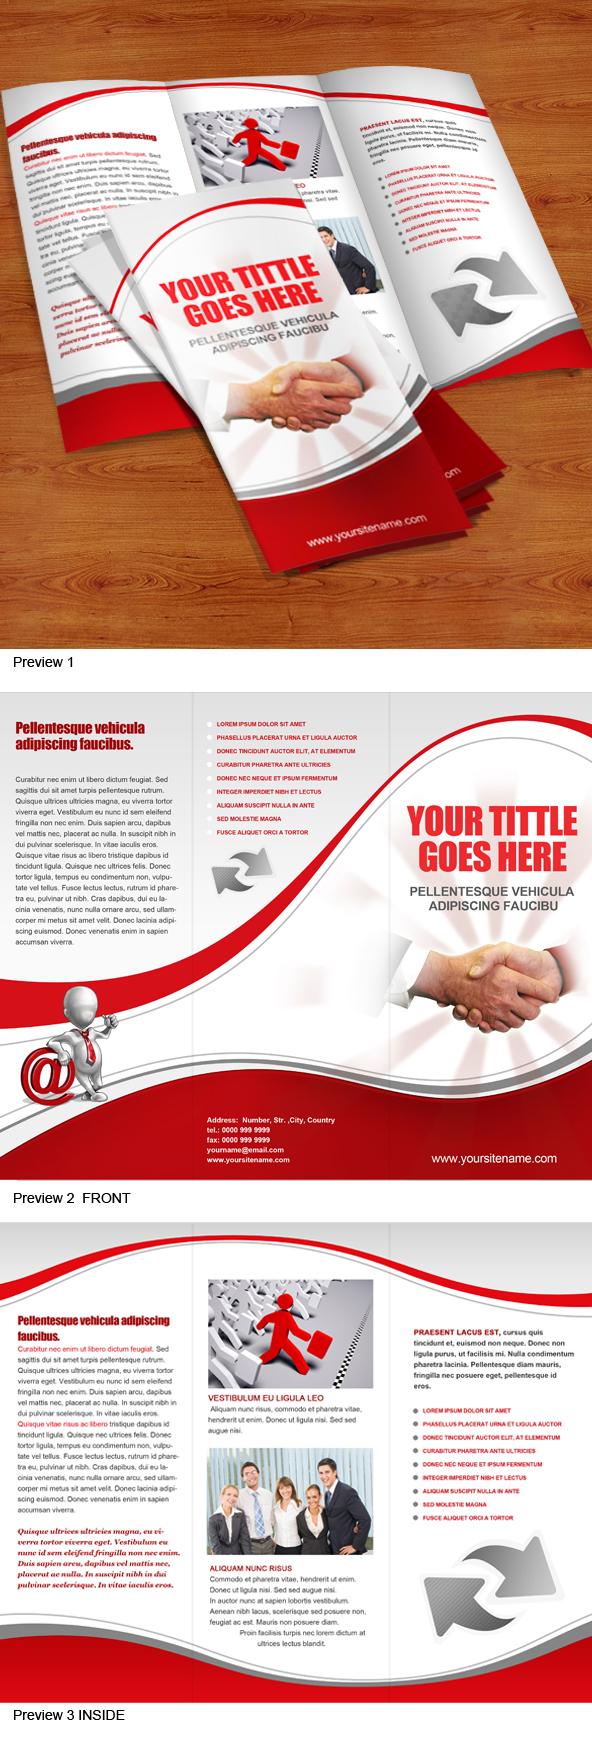 tri fold brochure template free download - 10 psd tri fold menu templates free images tri fold